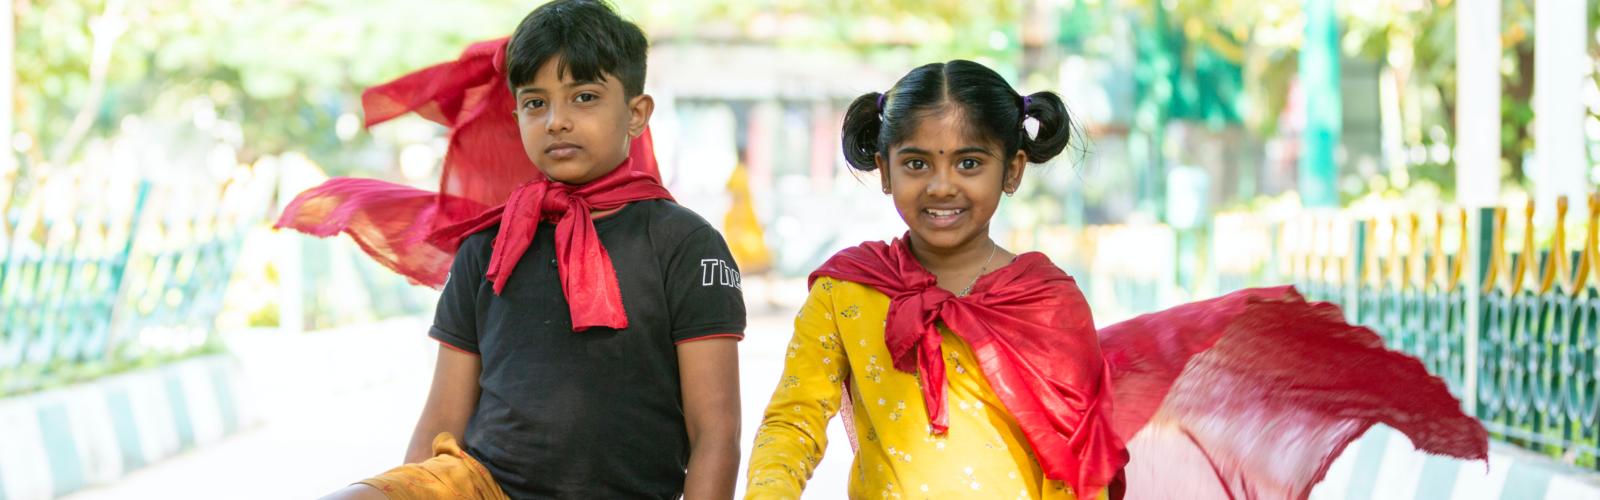 early childhood care - makkala jagriti